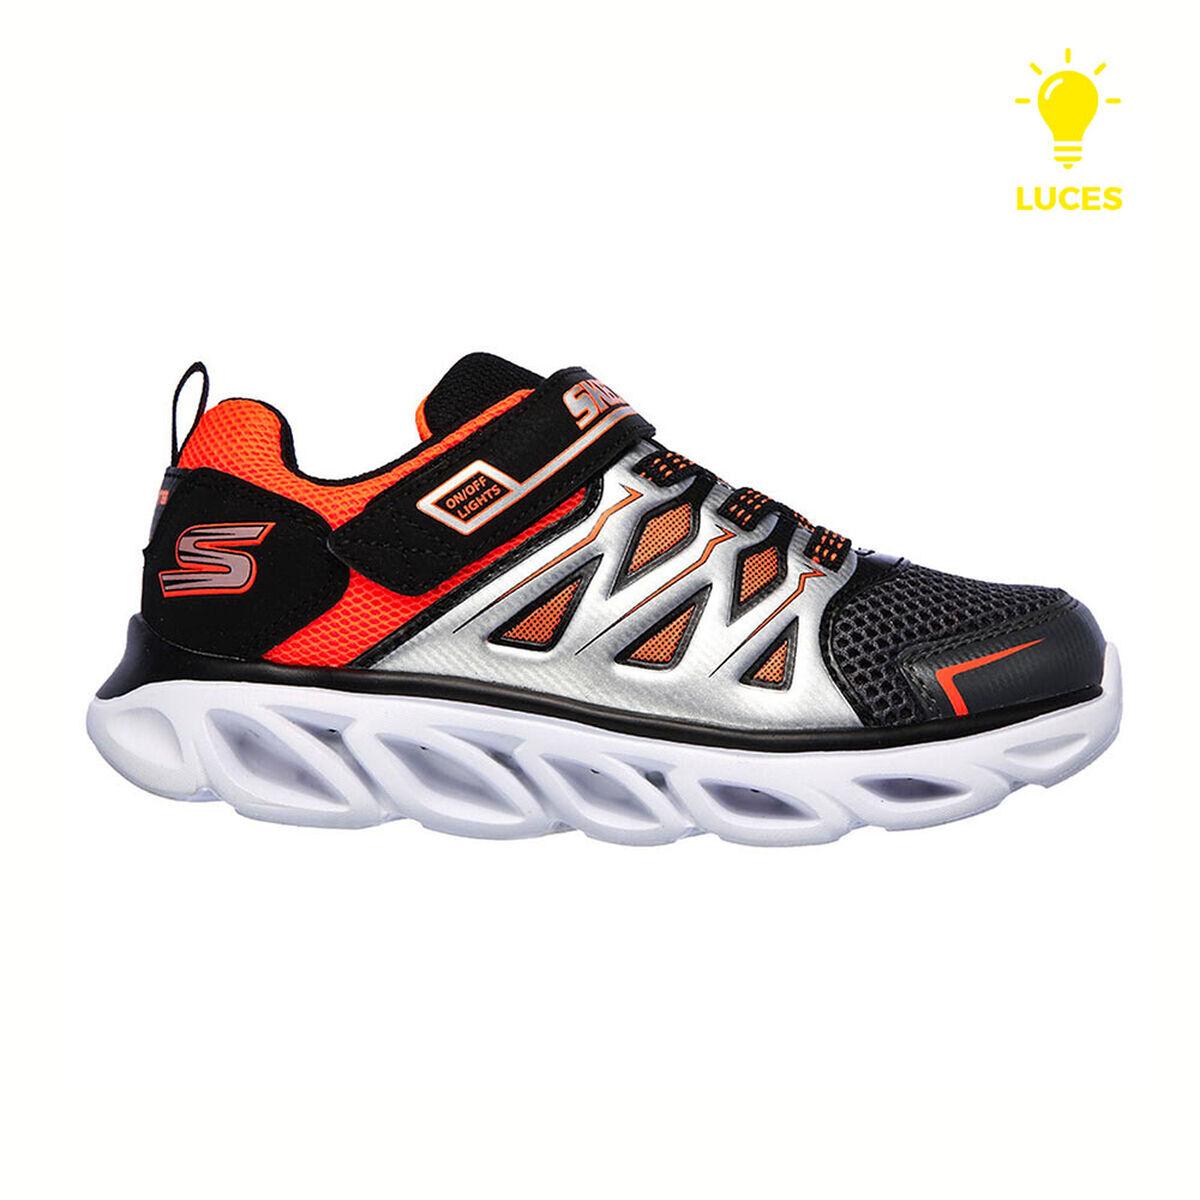 Zapatilla Con Luces Niño Skechers